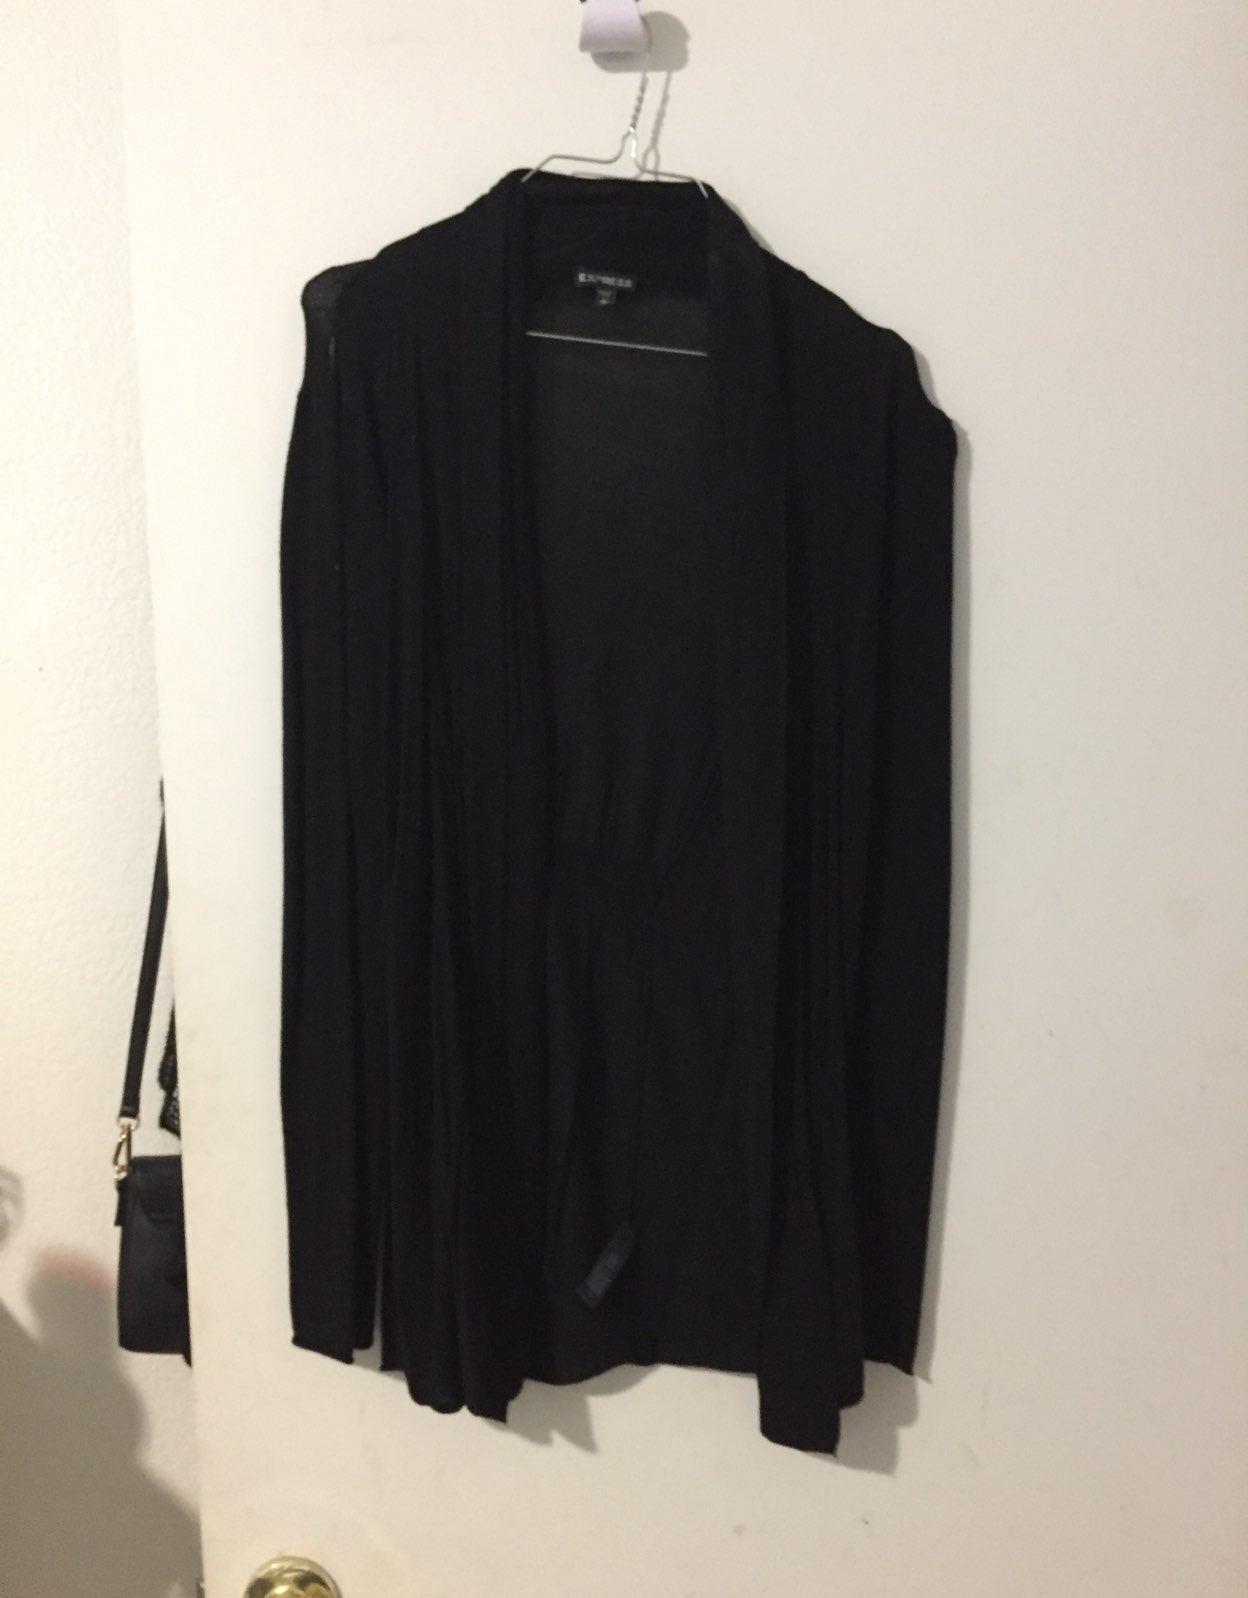 Express Black Cardigan - Mercari: BUY & SELL THINGS YOU LOVE